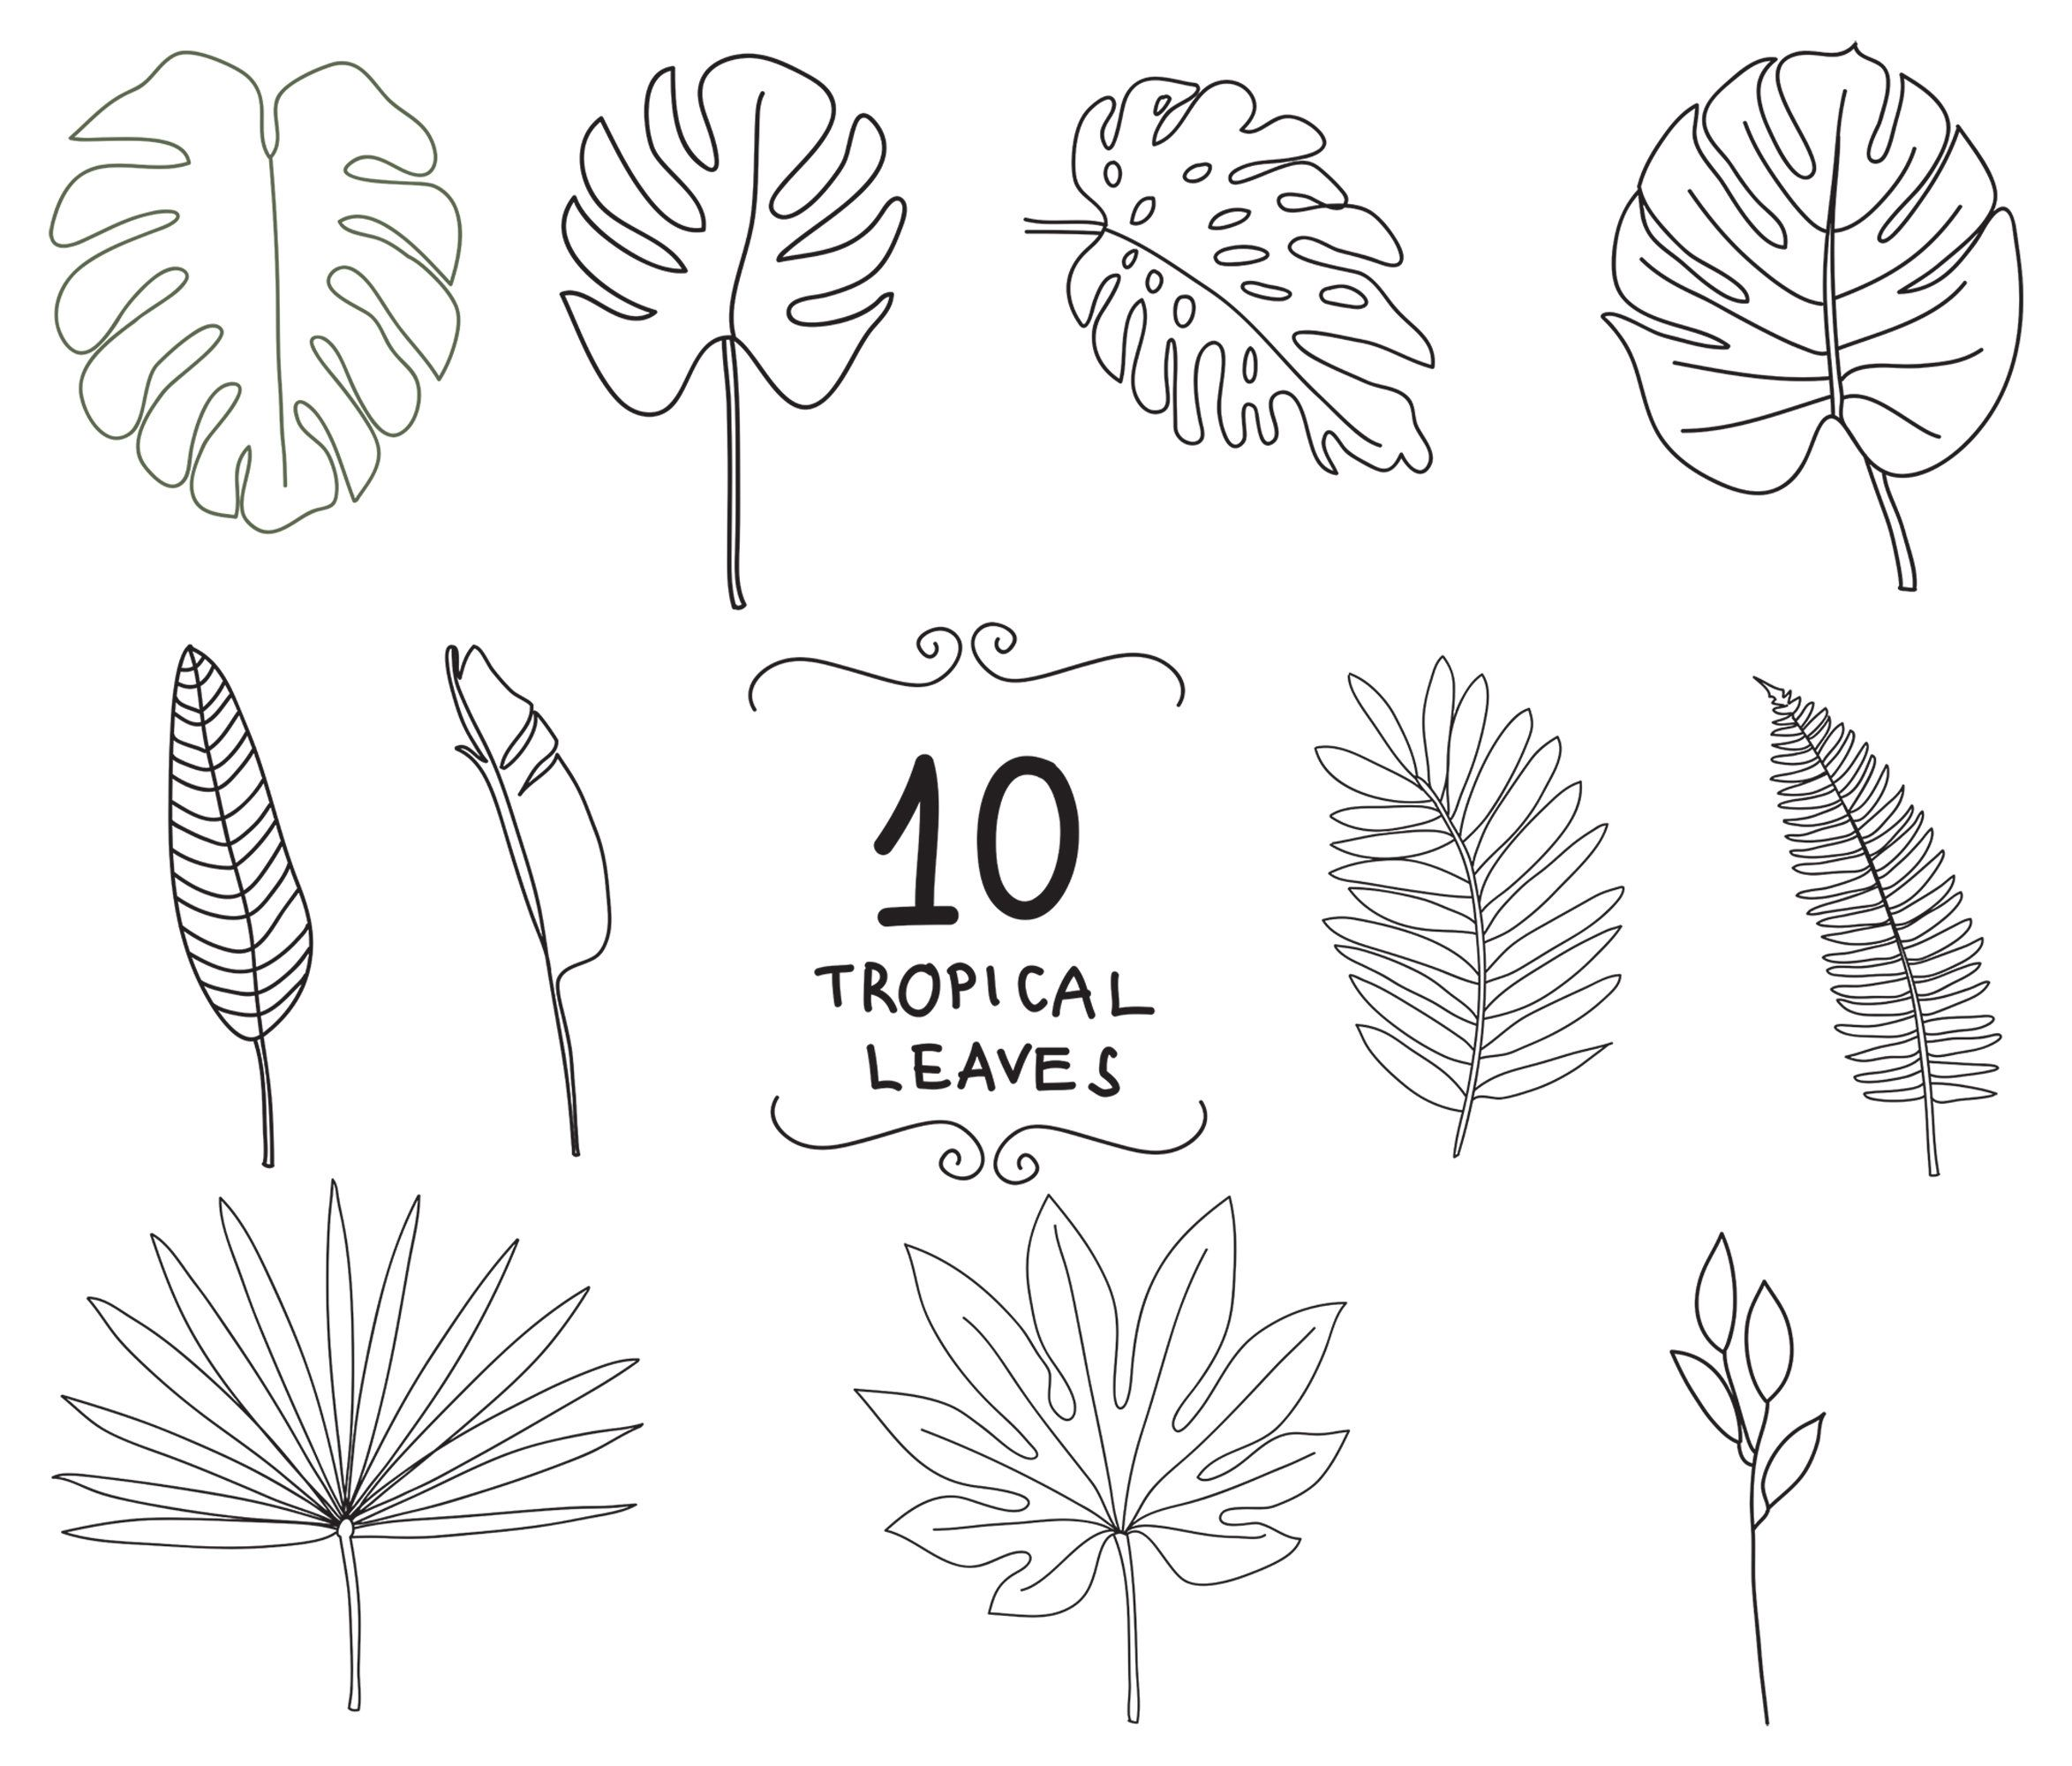 Tropical Leaves Svg And Png Doodles Jungle Leaf Svg Leaves Etsy Leaves Doodle Leaf Drawing Plant Doodle A l i c e m c r a e _. png doodles jungle leaf svg leaves